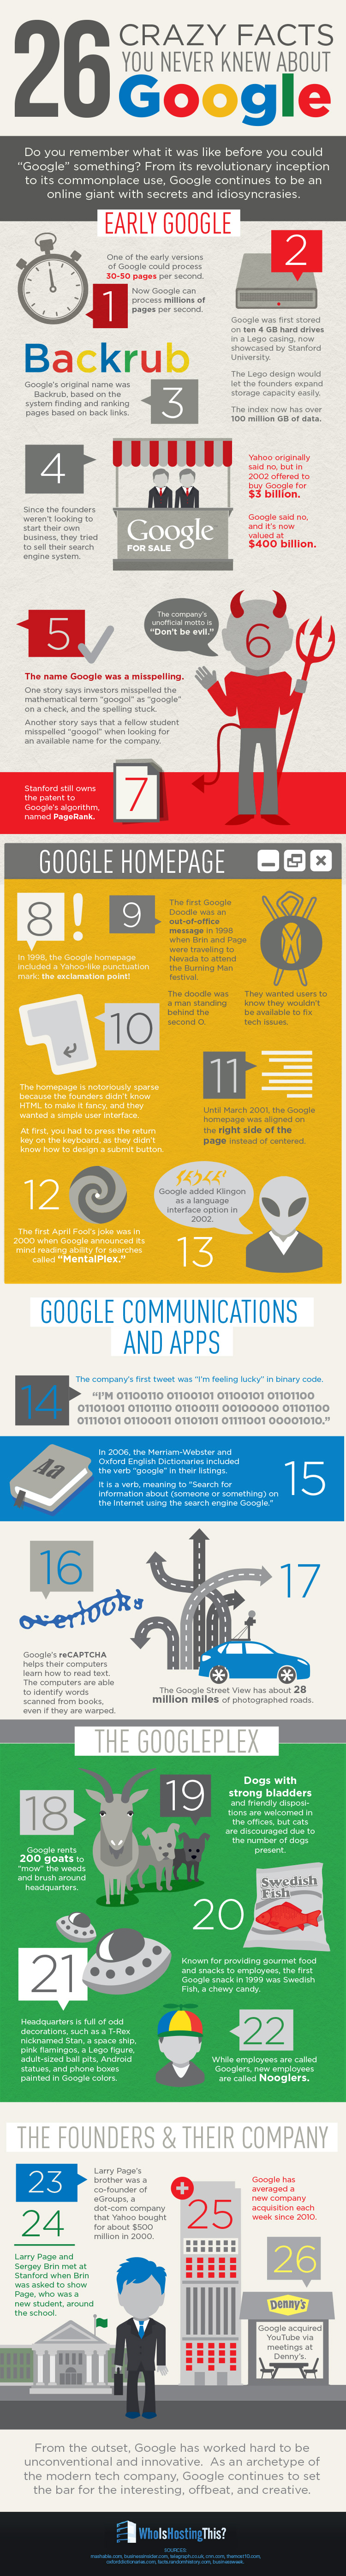 infographie-infos-folles-google